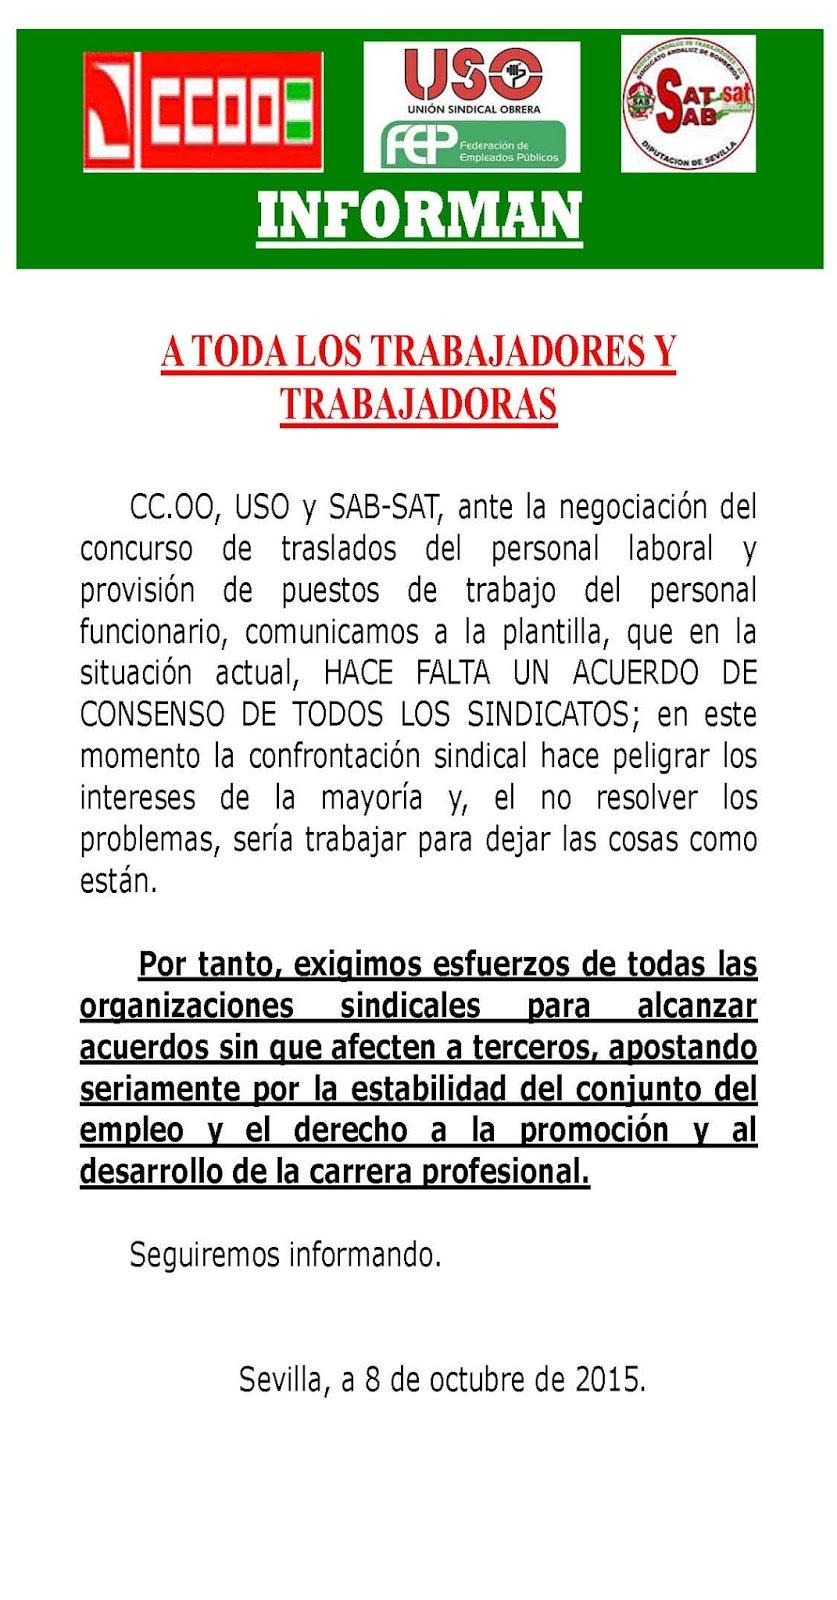 Uni n sindical obrera diputaci n de sevilla comunicado for Ccoo concurso de traslados